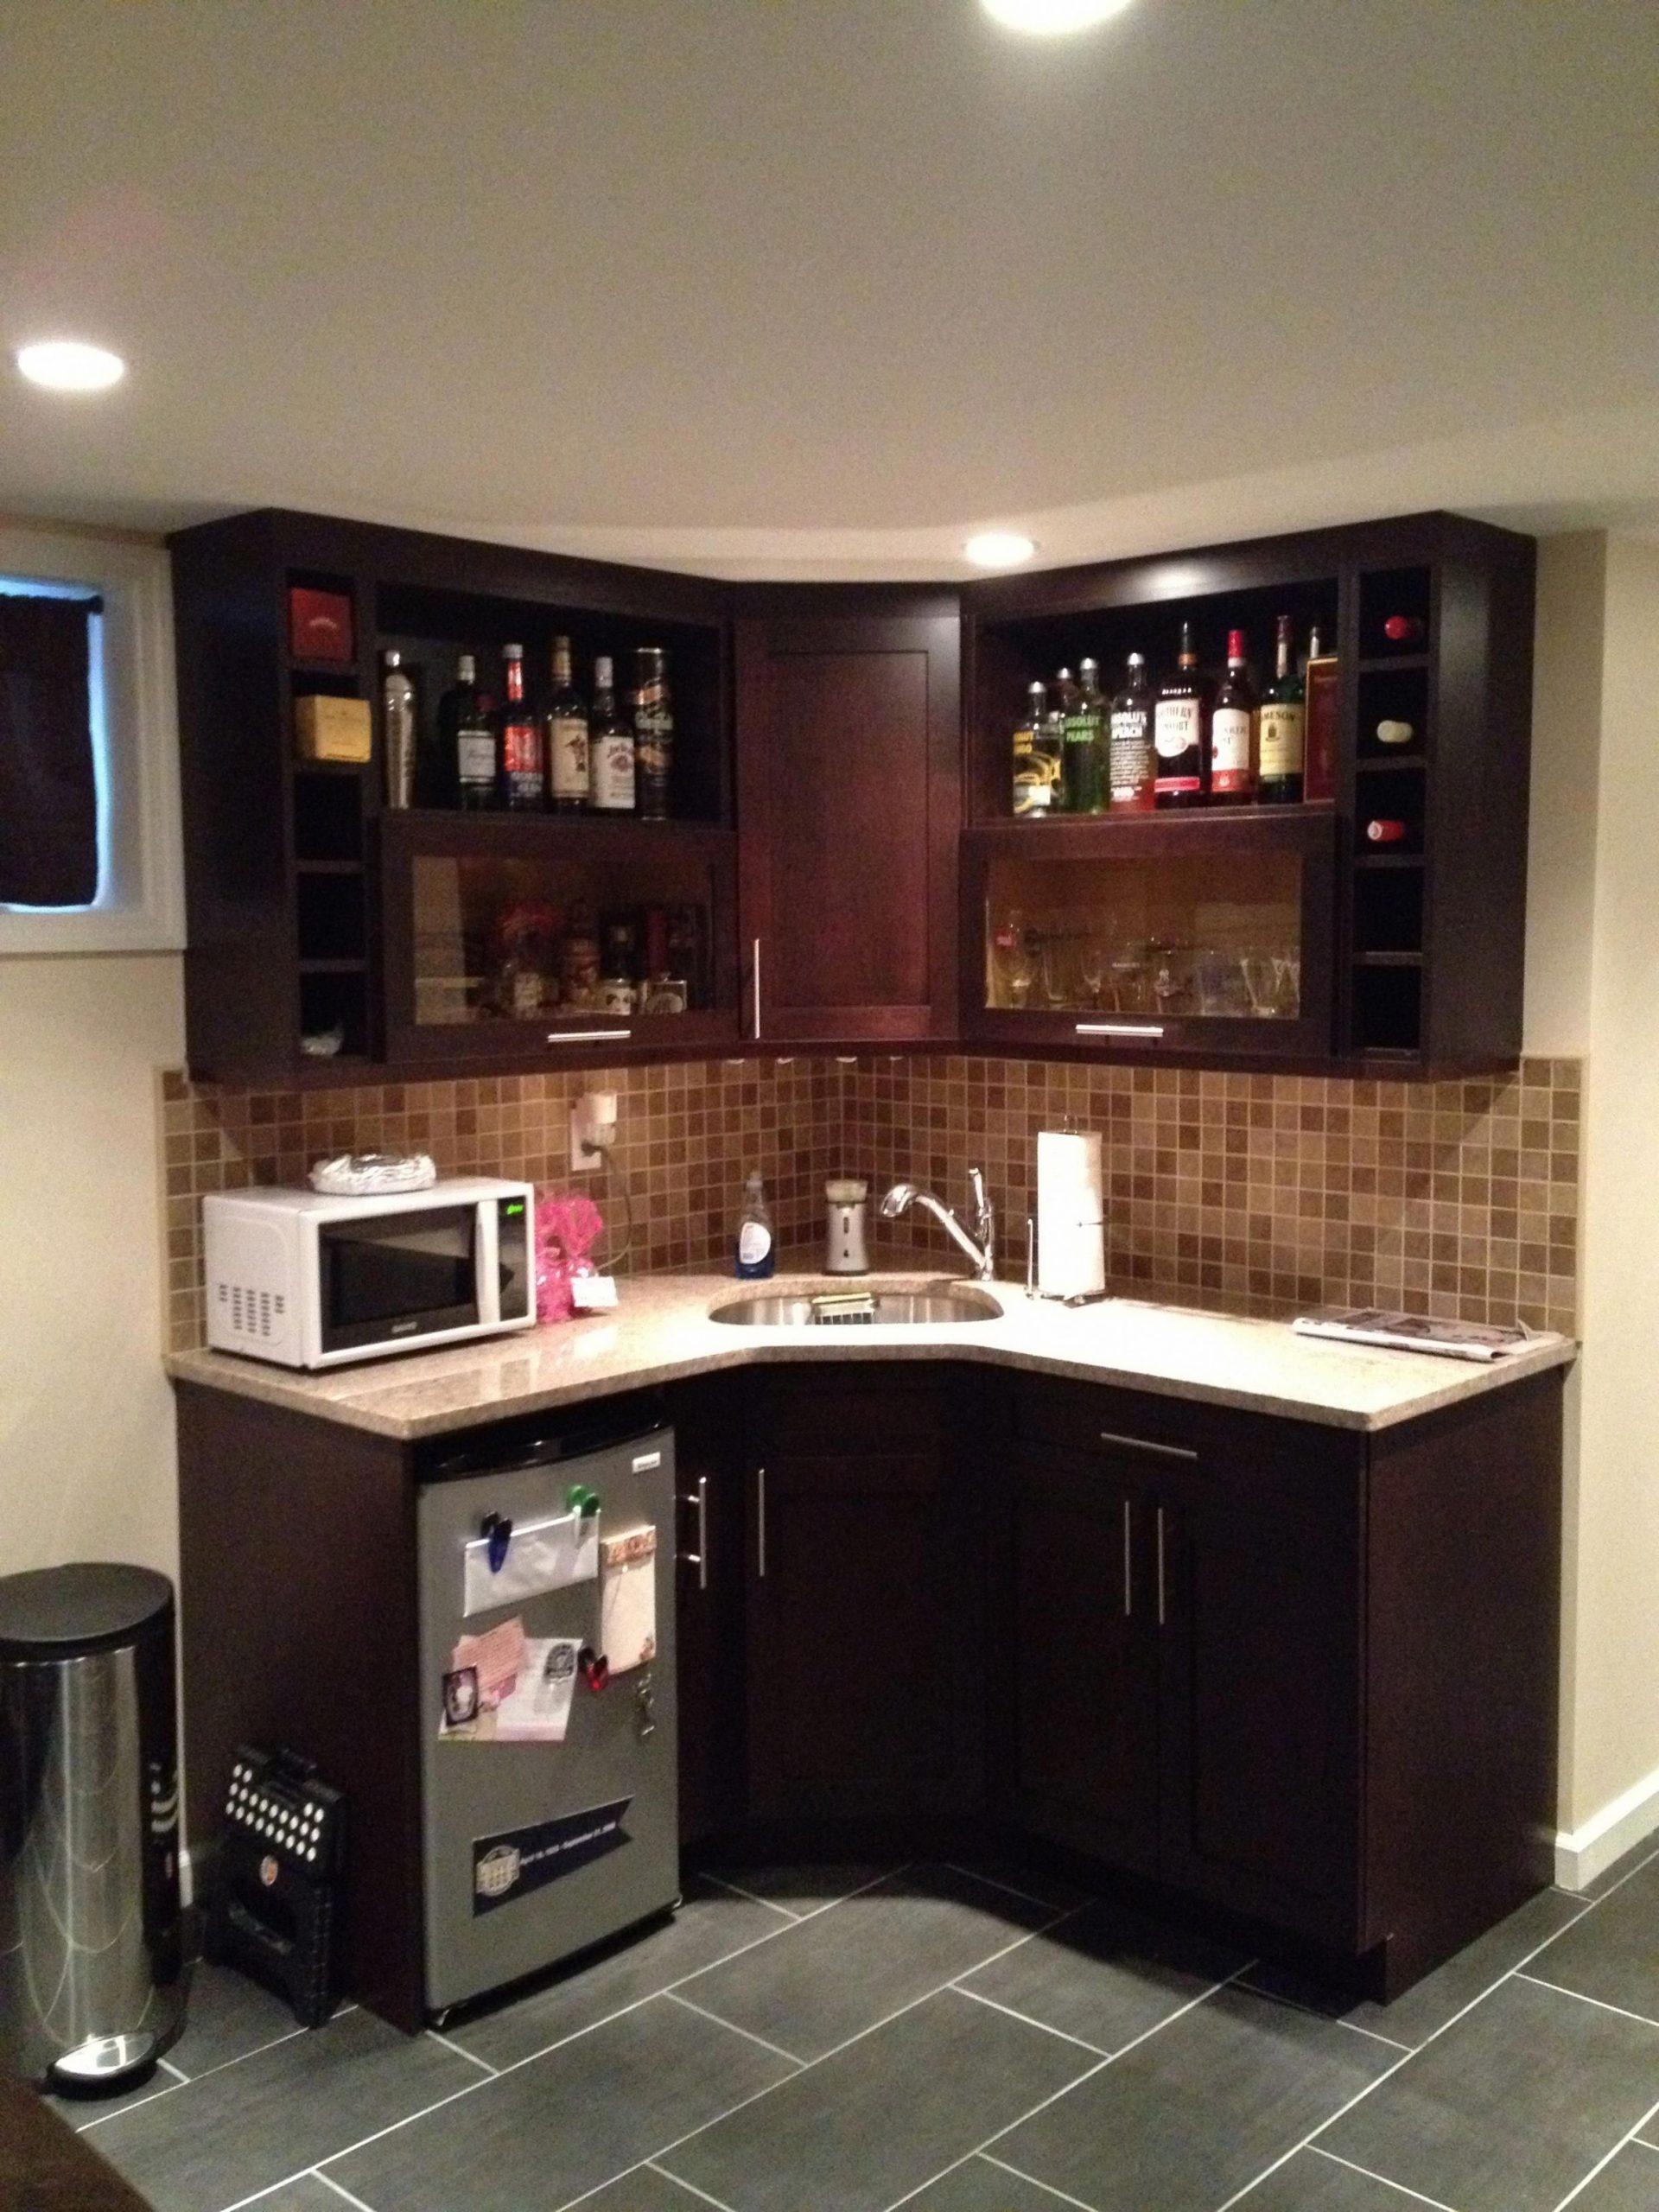 basement bedroom suite #luxurybasementideas  - Bedroom Kitchenette Ideas